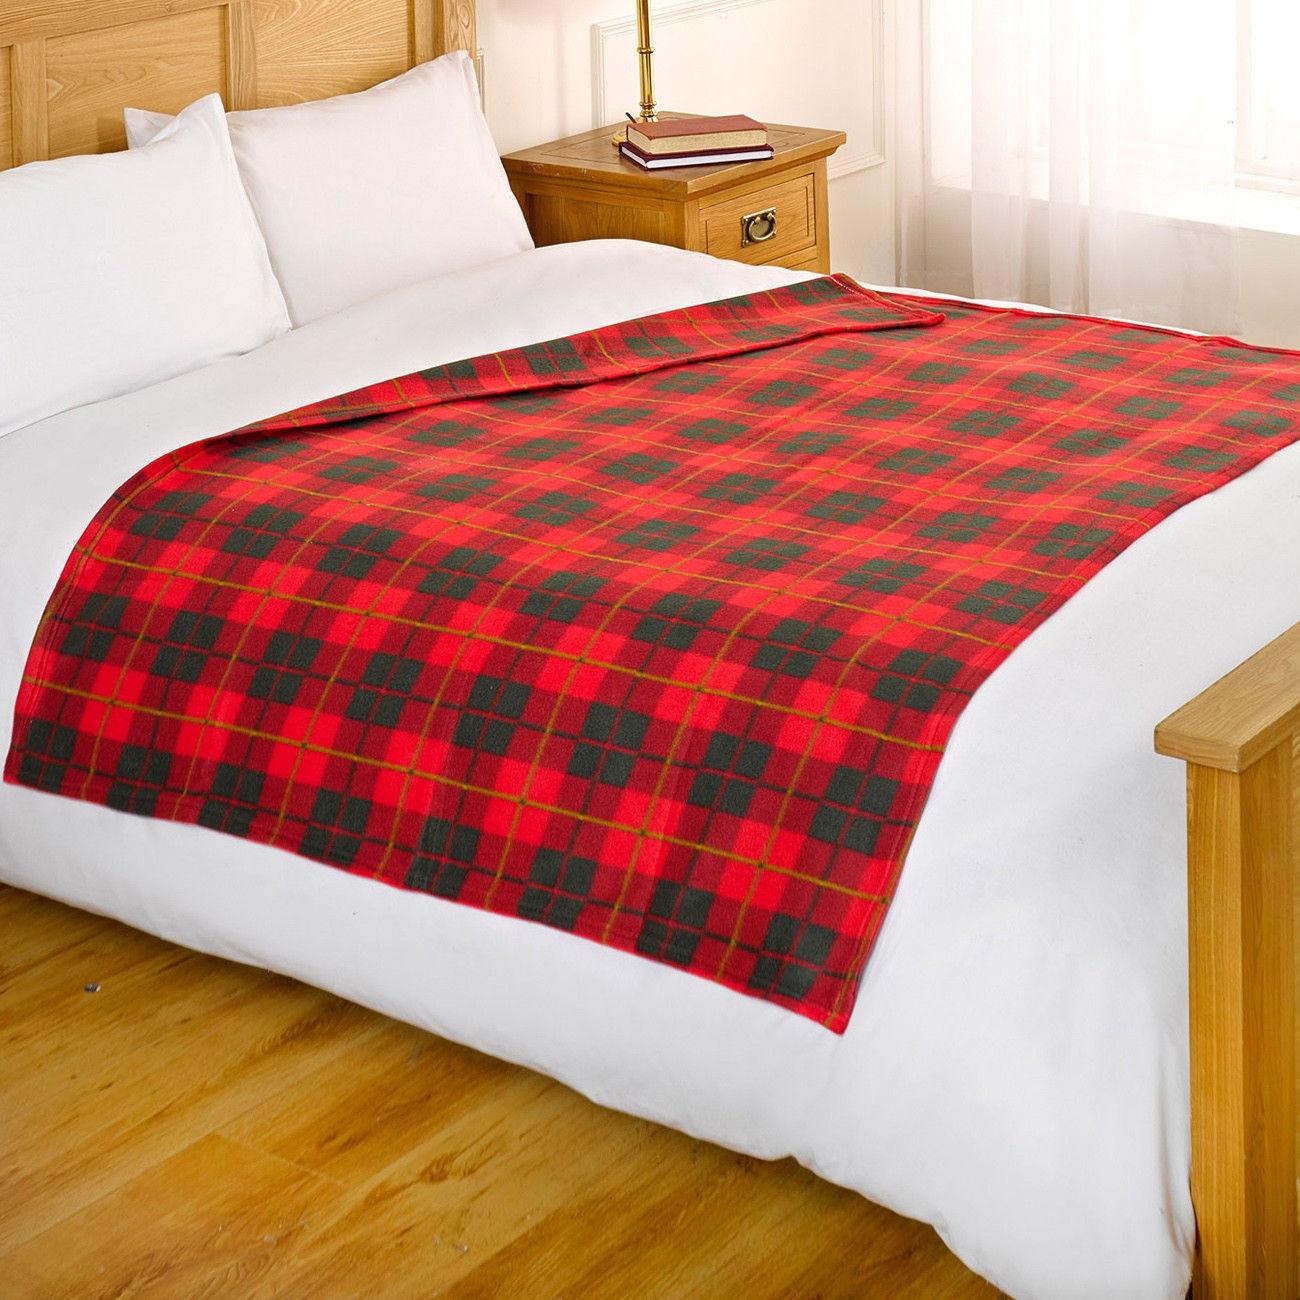 Dreamscene Bed Fleece Throw Blanket Super Soft Warm